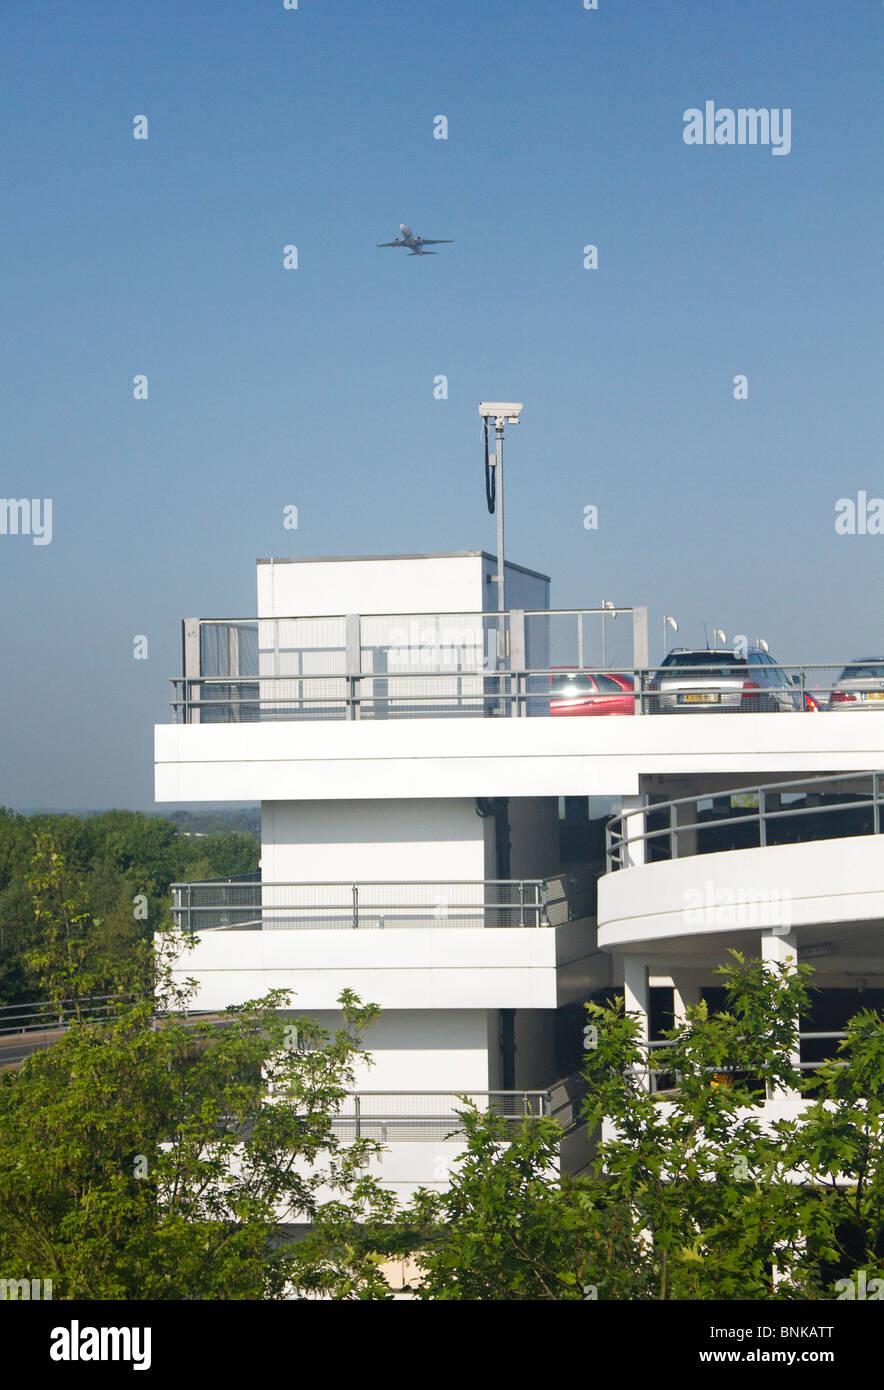 Multistorey carpark at Gatwick Airport, West Sussex, UK - Stock Image